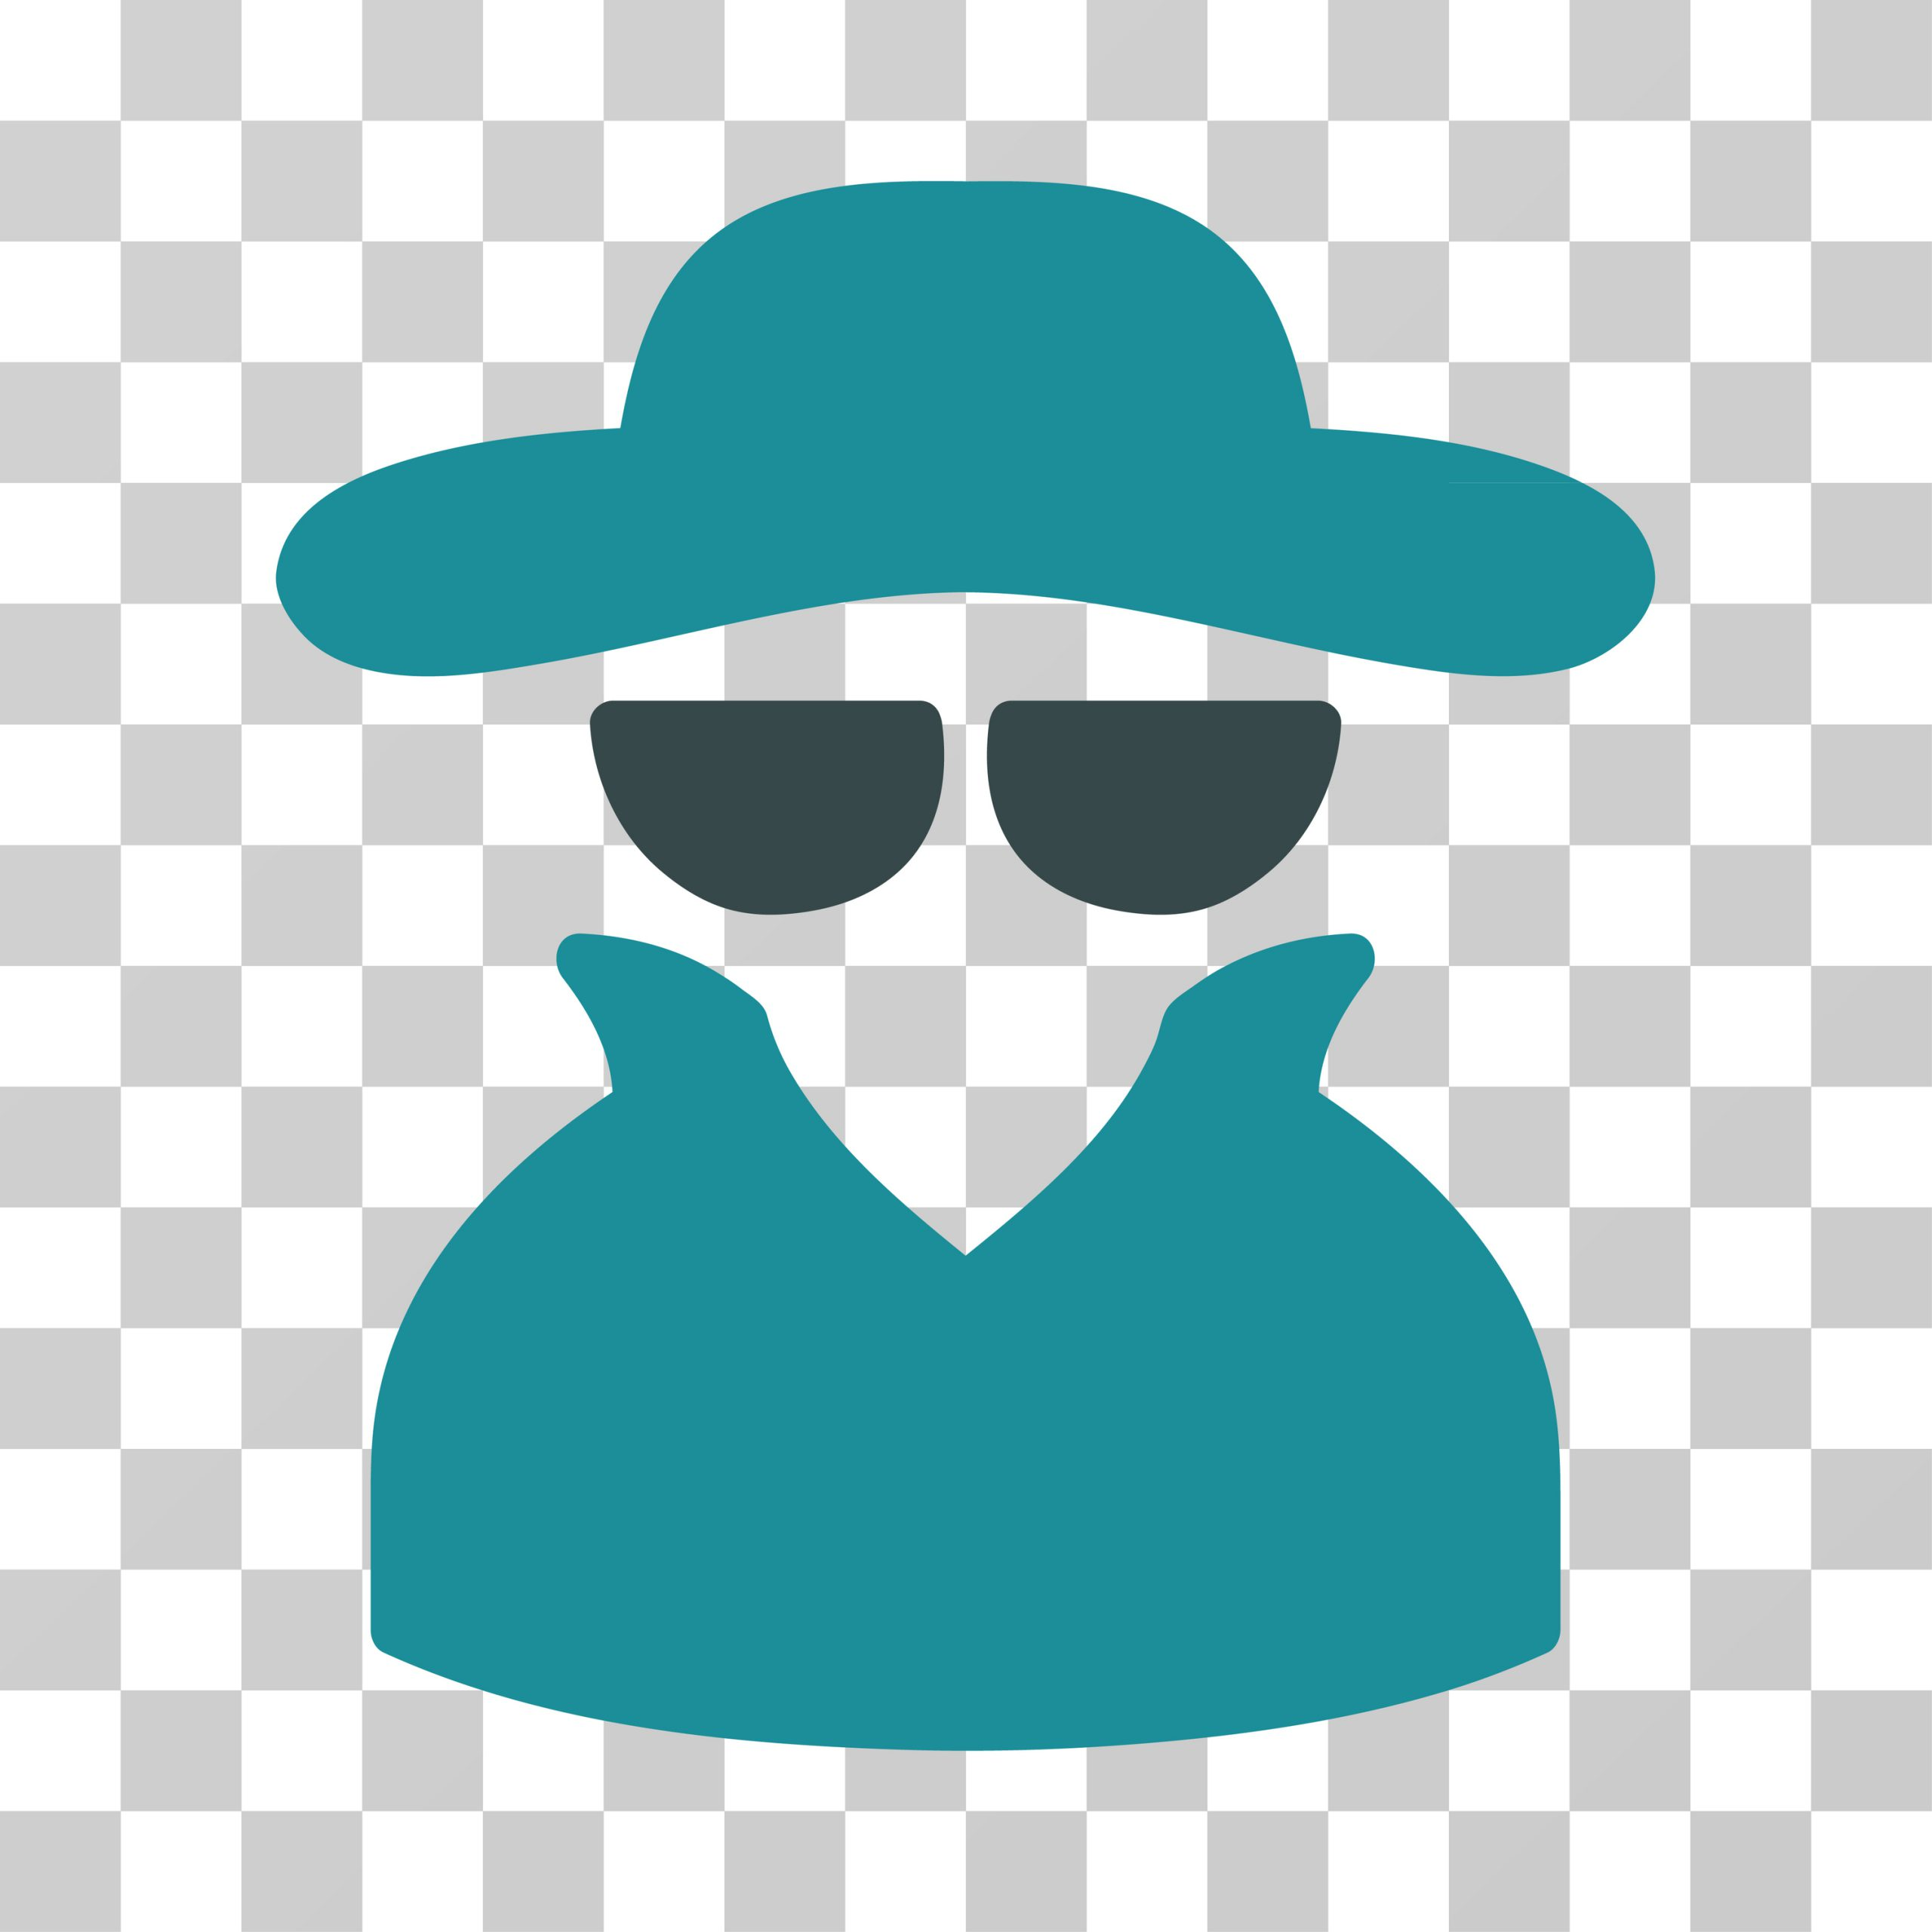 BS_Spy Icon_Green_Aha-Soft_168536693